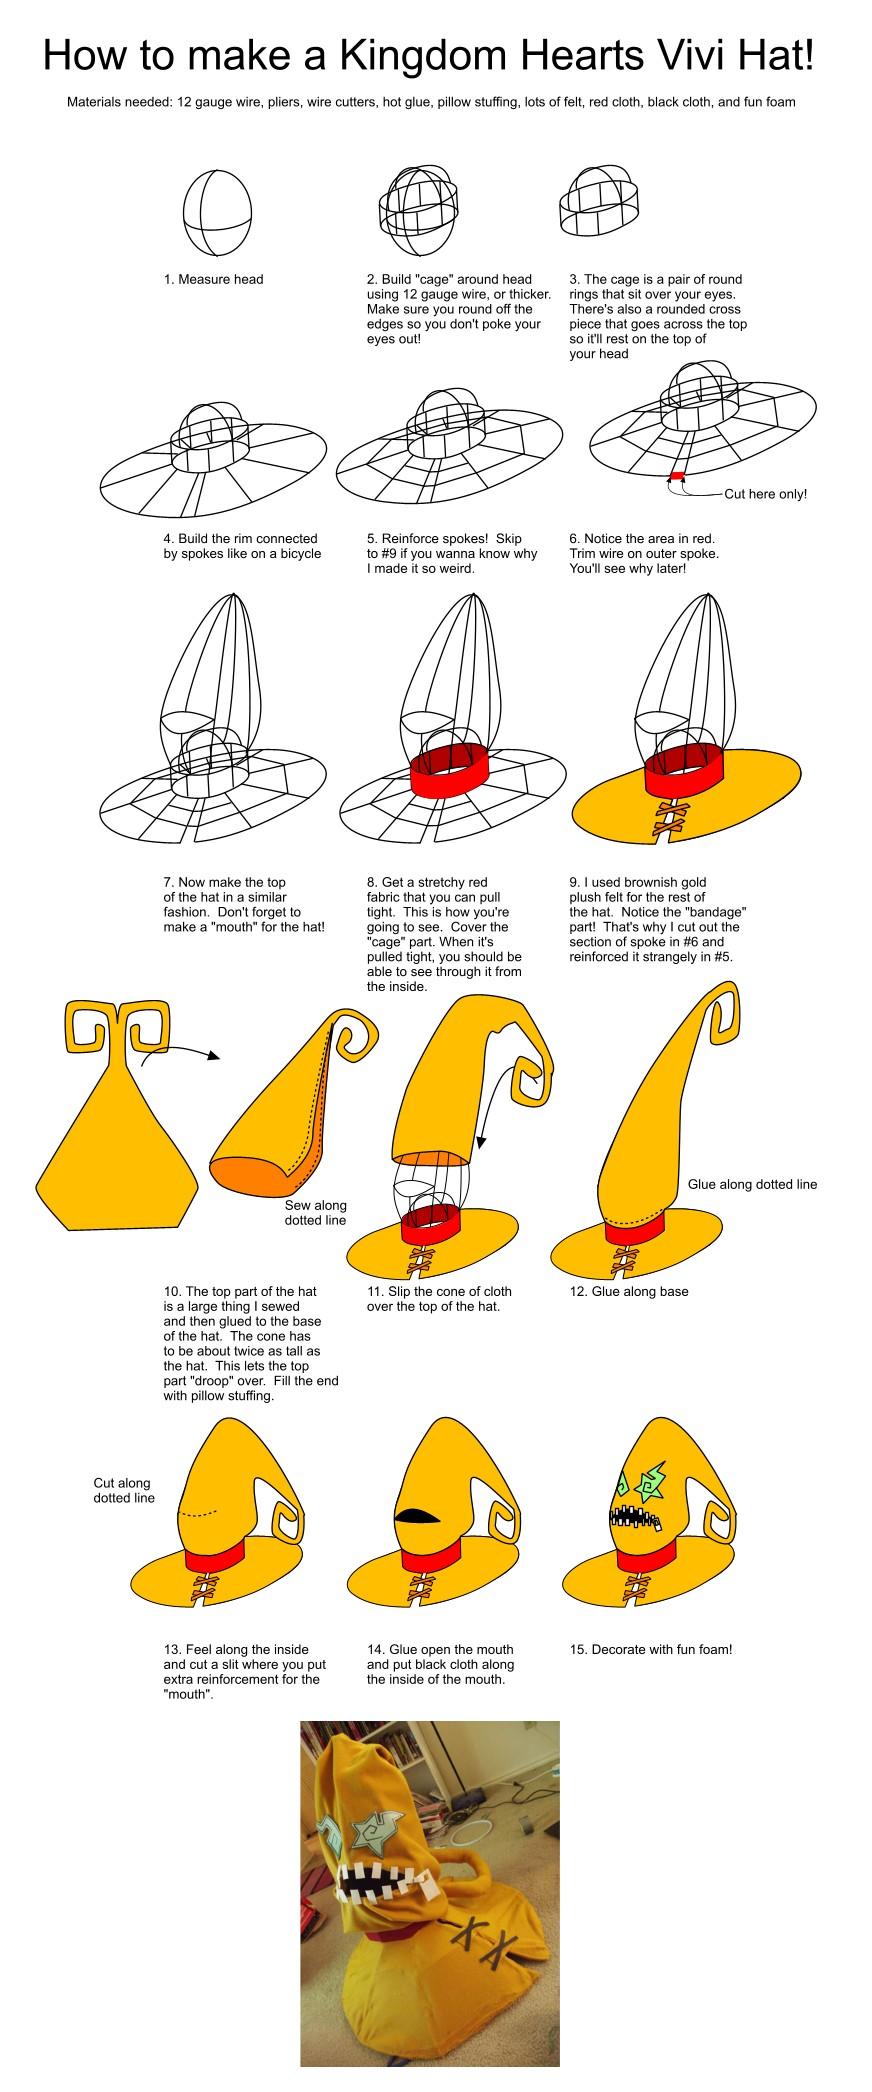 Vivi Hat Tutorial by HoiHoiSan